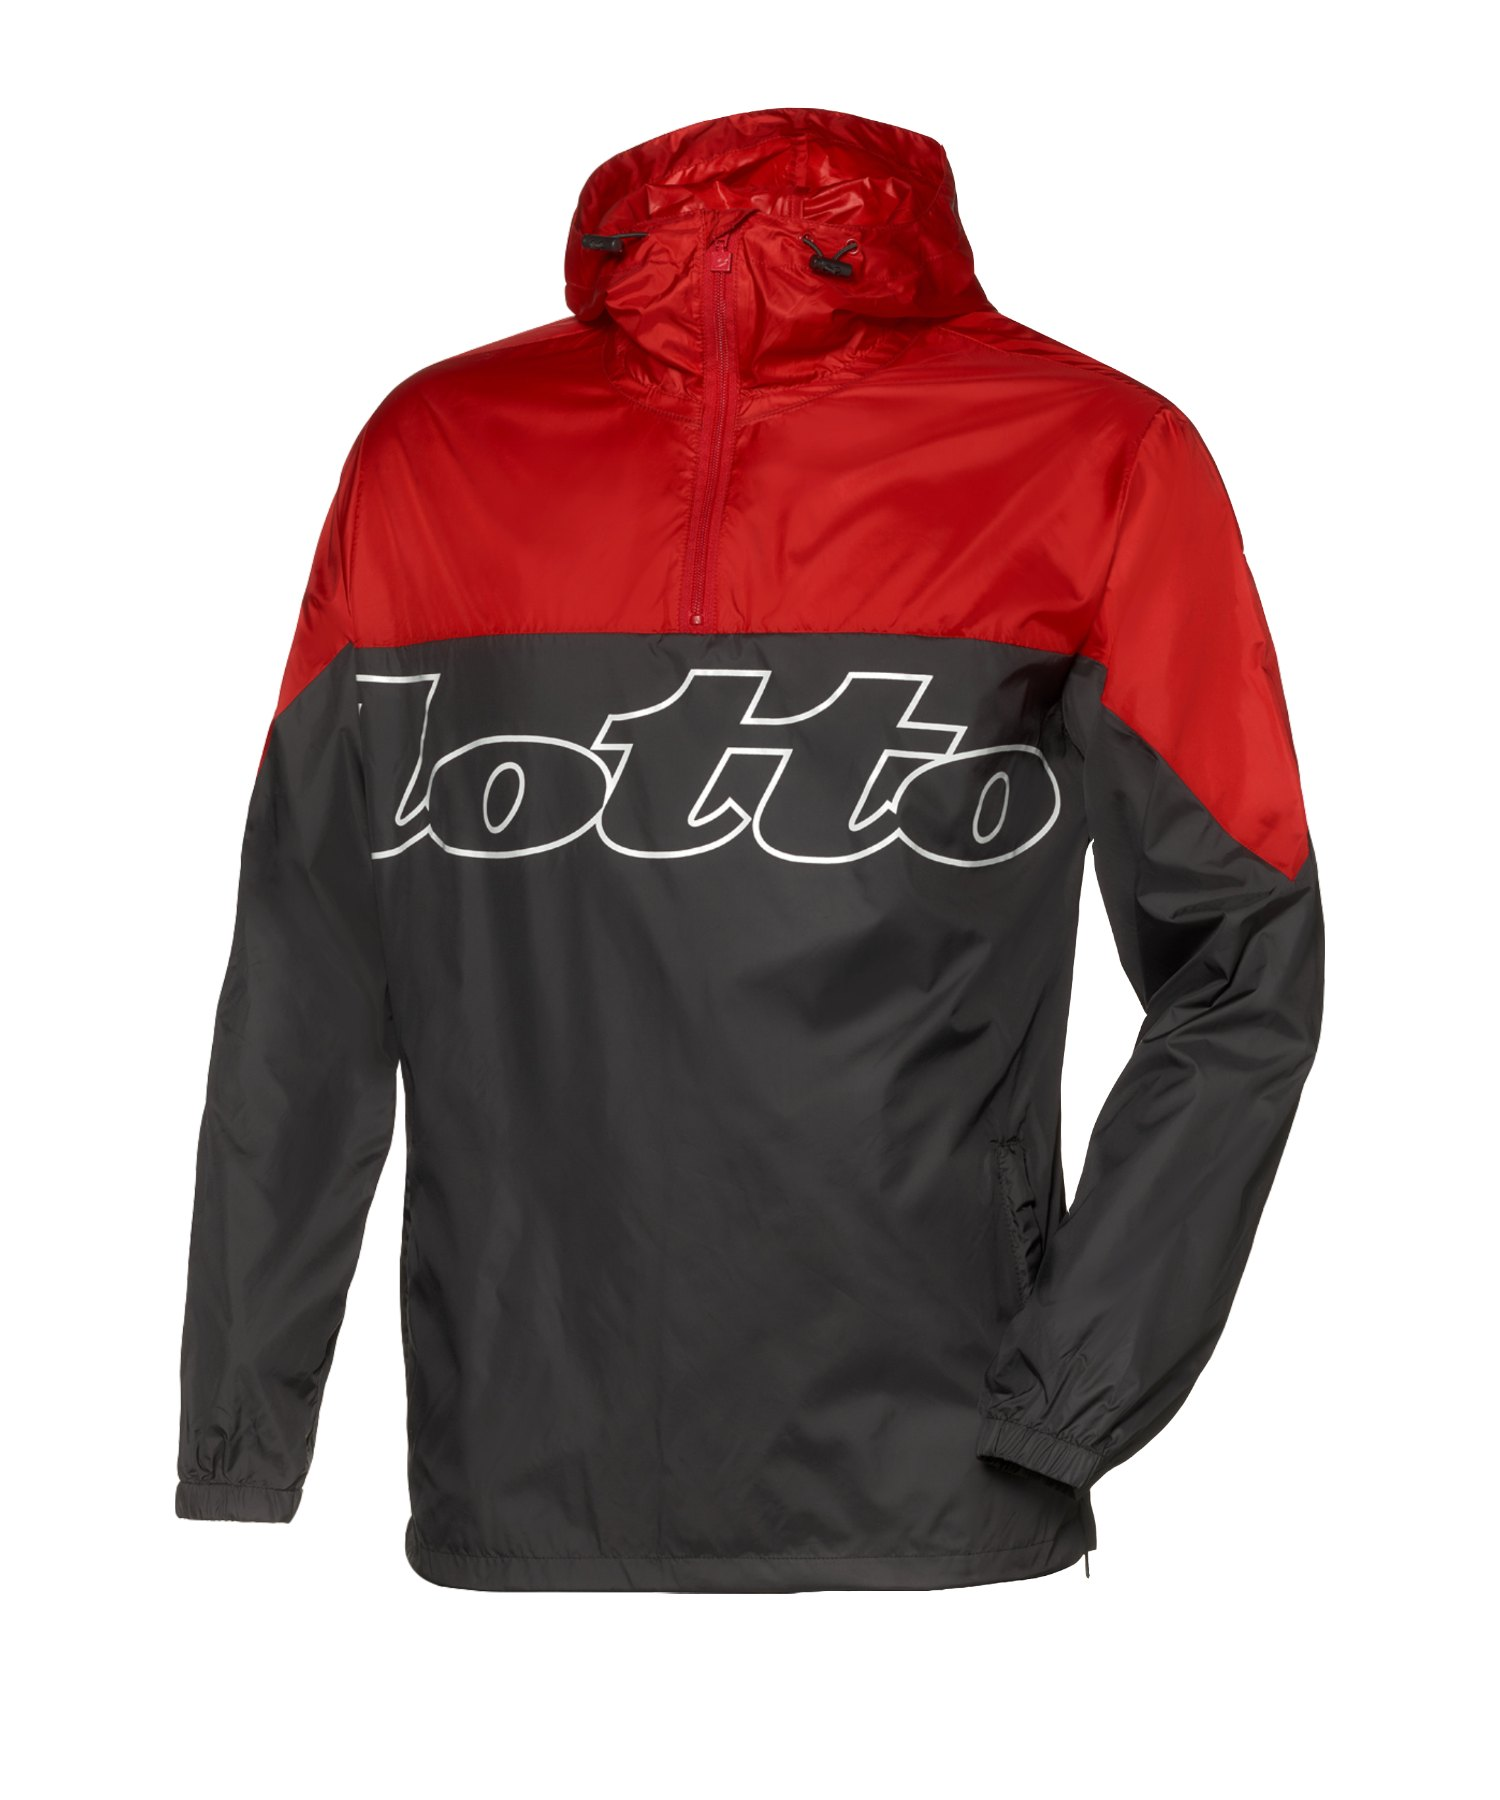 Lotto Athletica III Woven Kapuzensweatjacke F2DN - schwarz